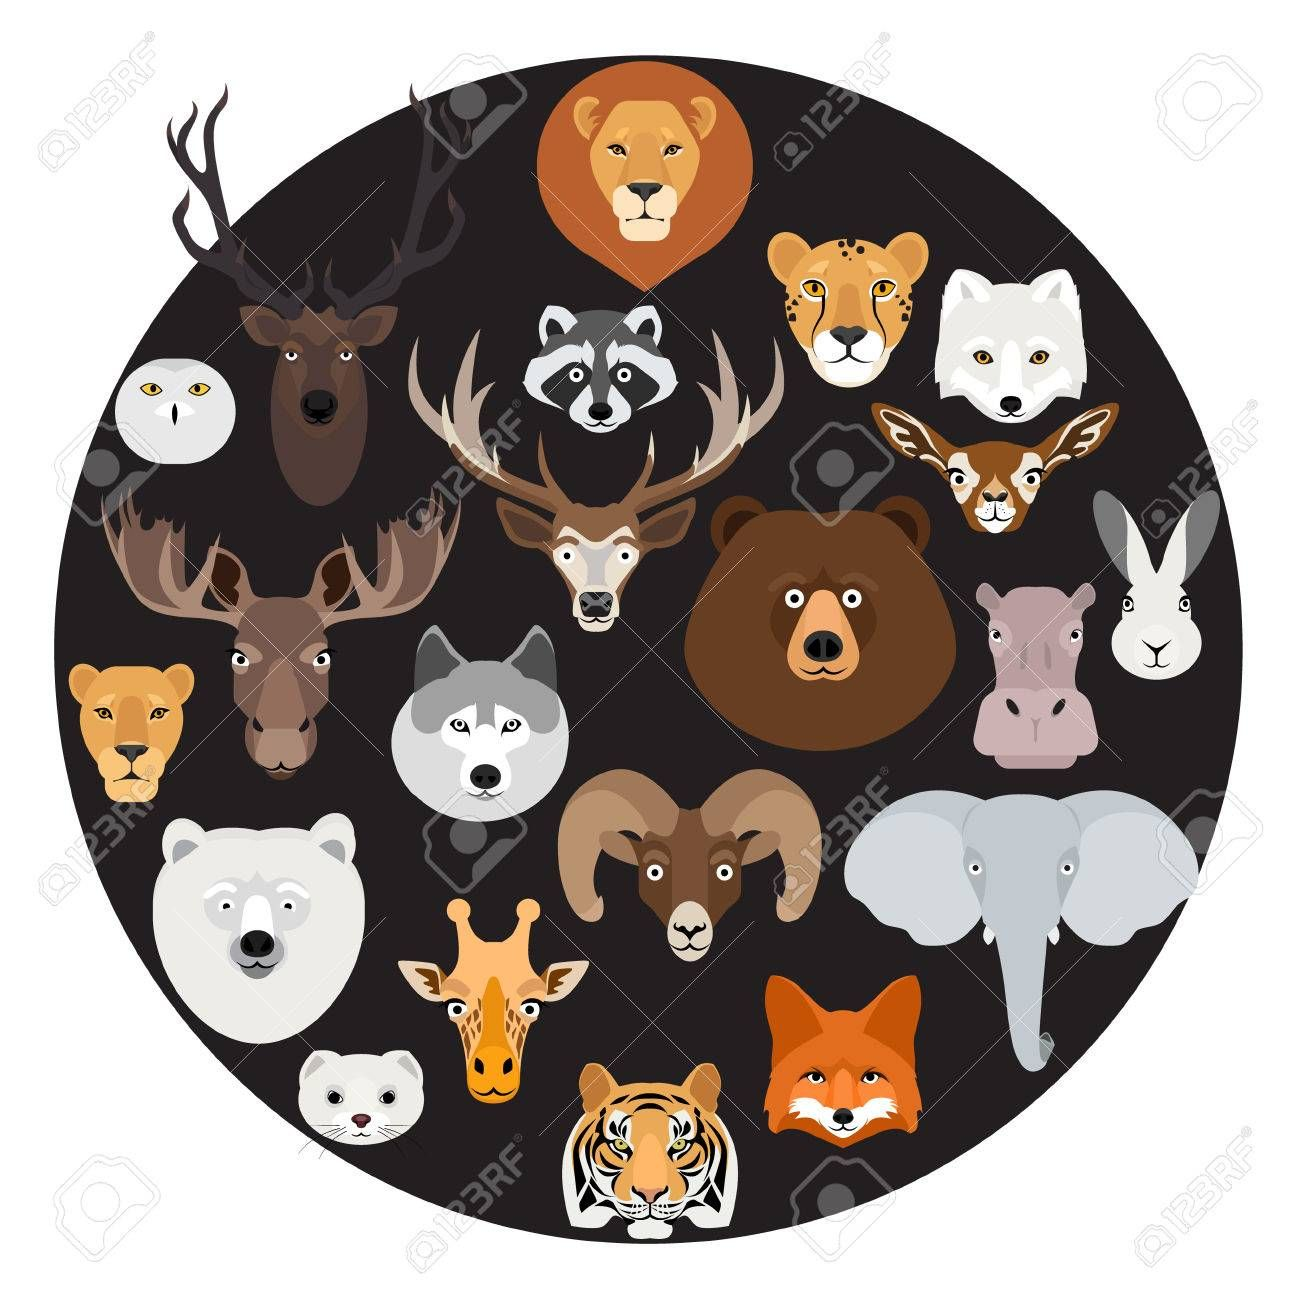 Stock Photo Caras De Animales